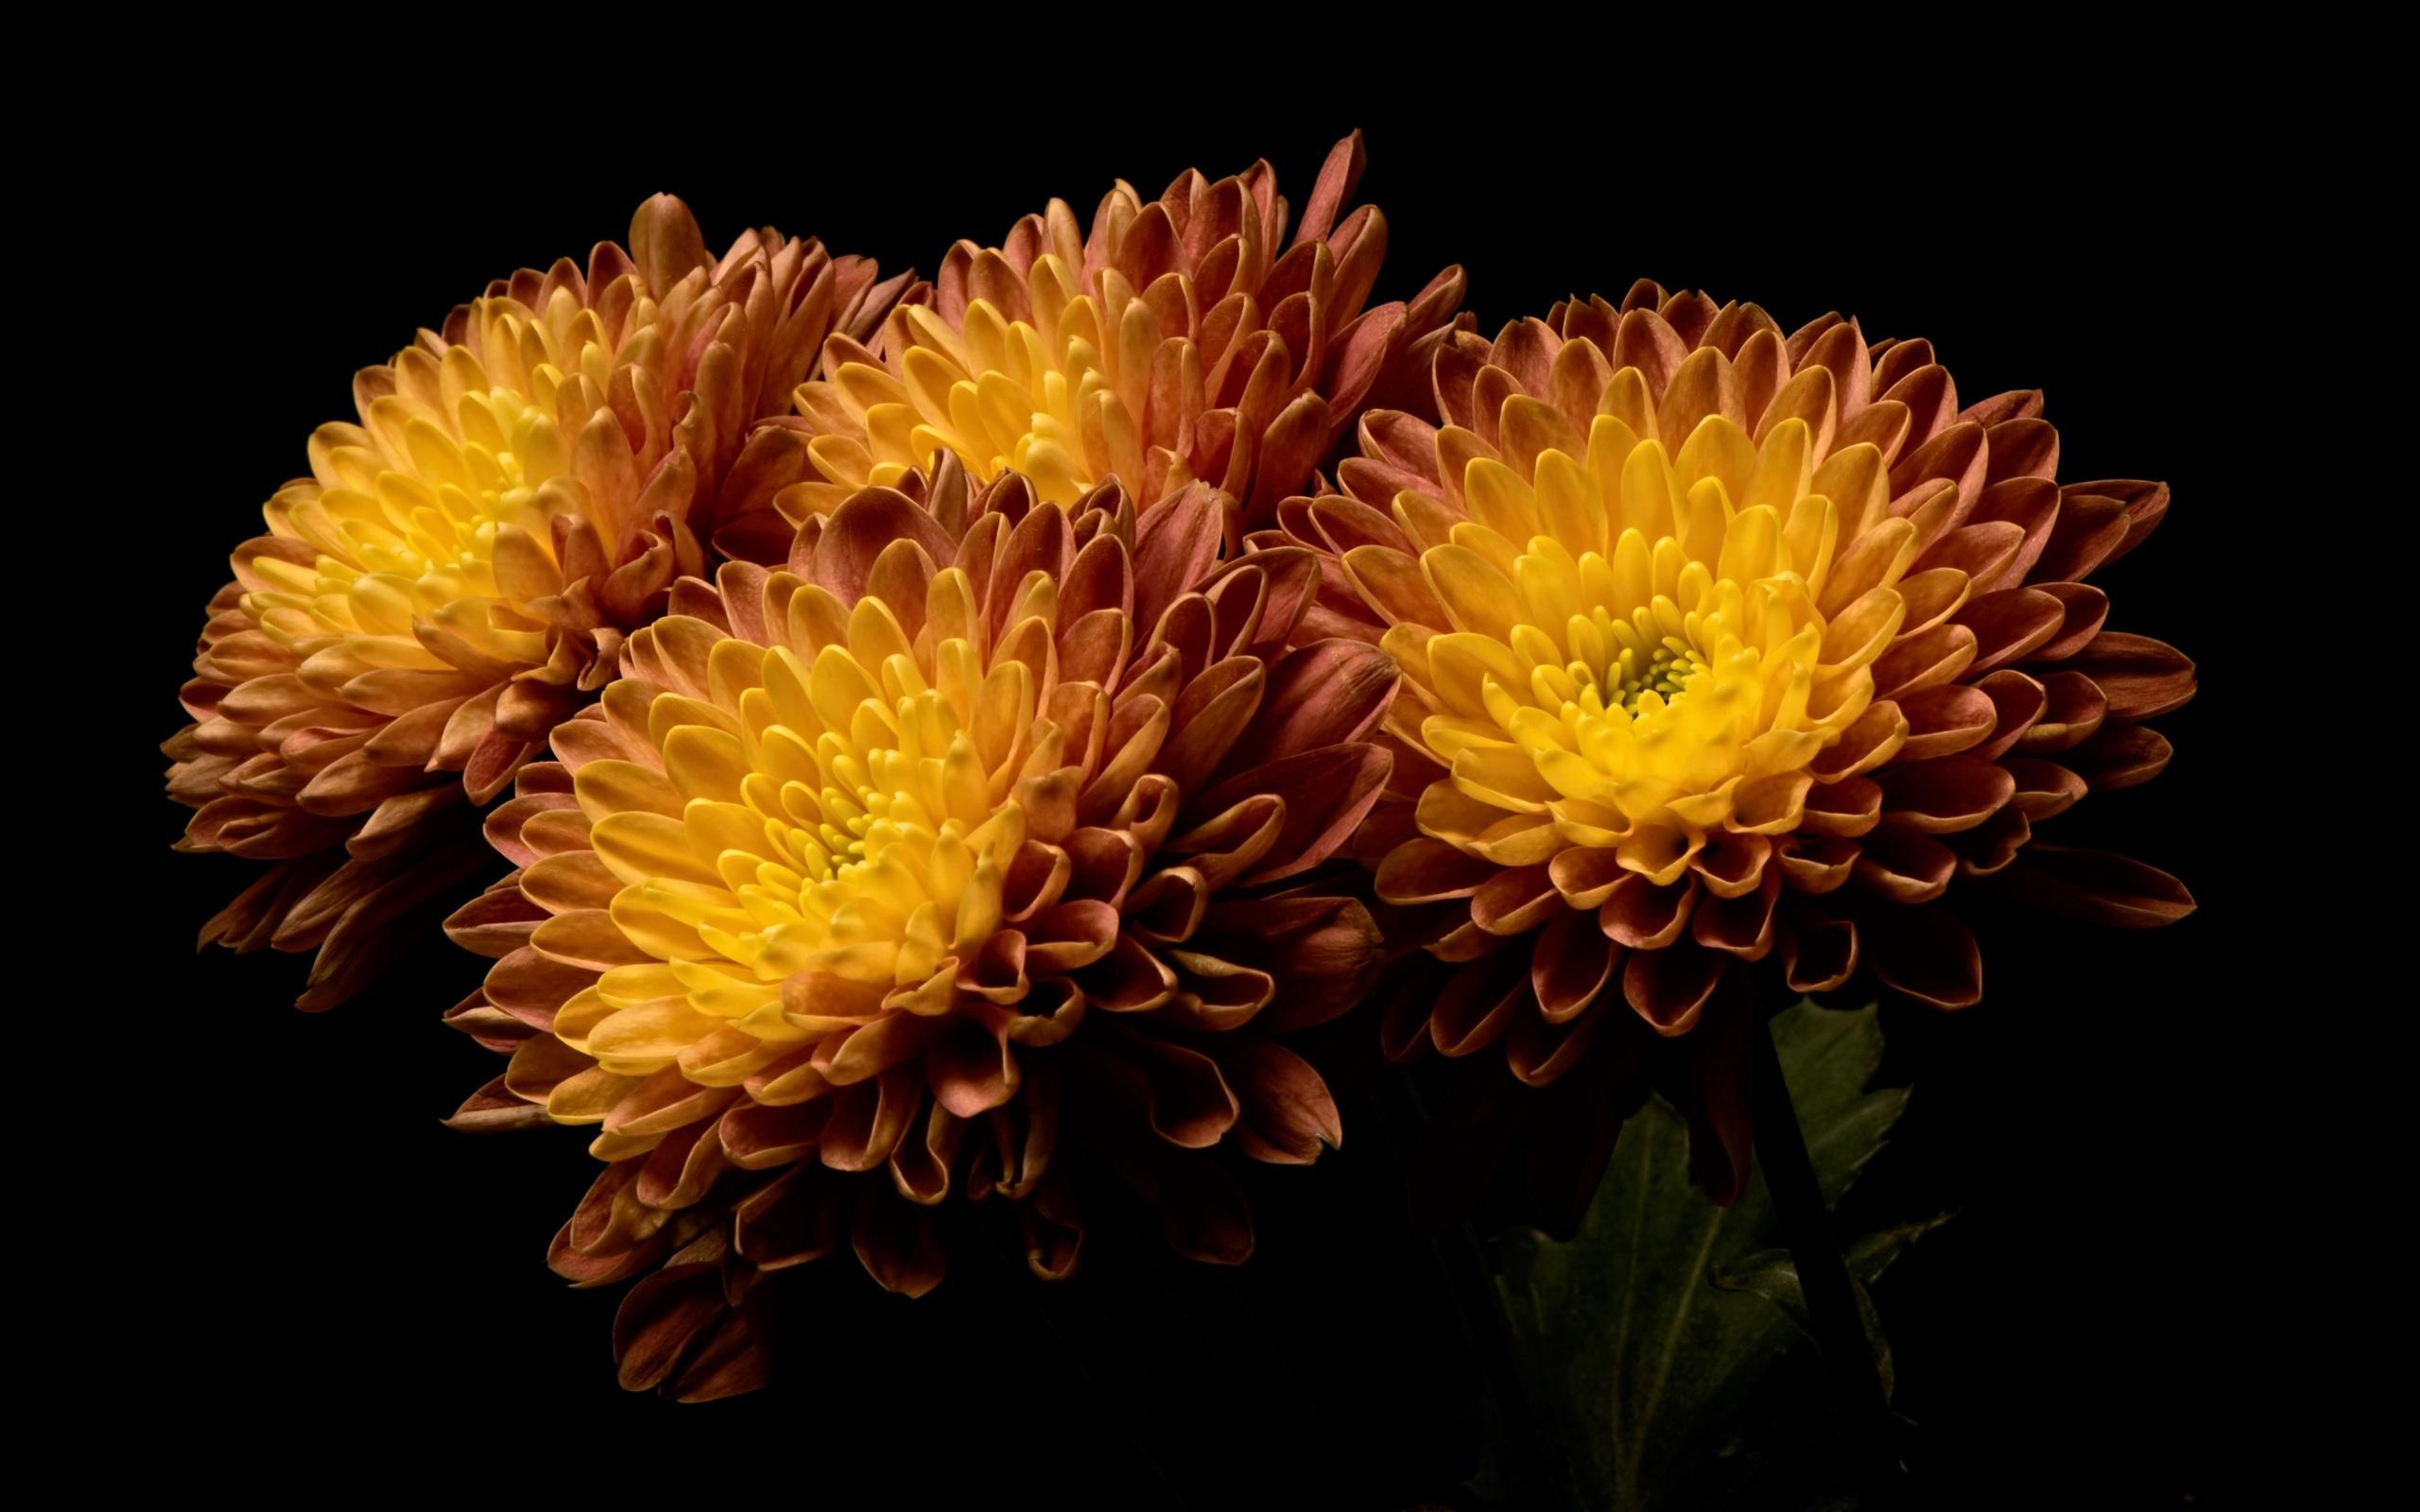 Fondos De Pantalla Flores Naranjas Fondo Negro 2560x1600 Hd Imagen